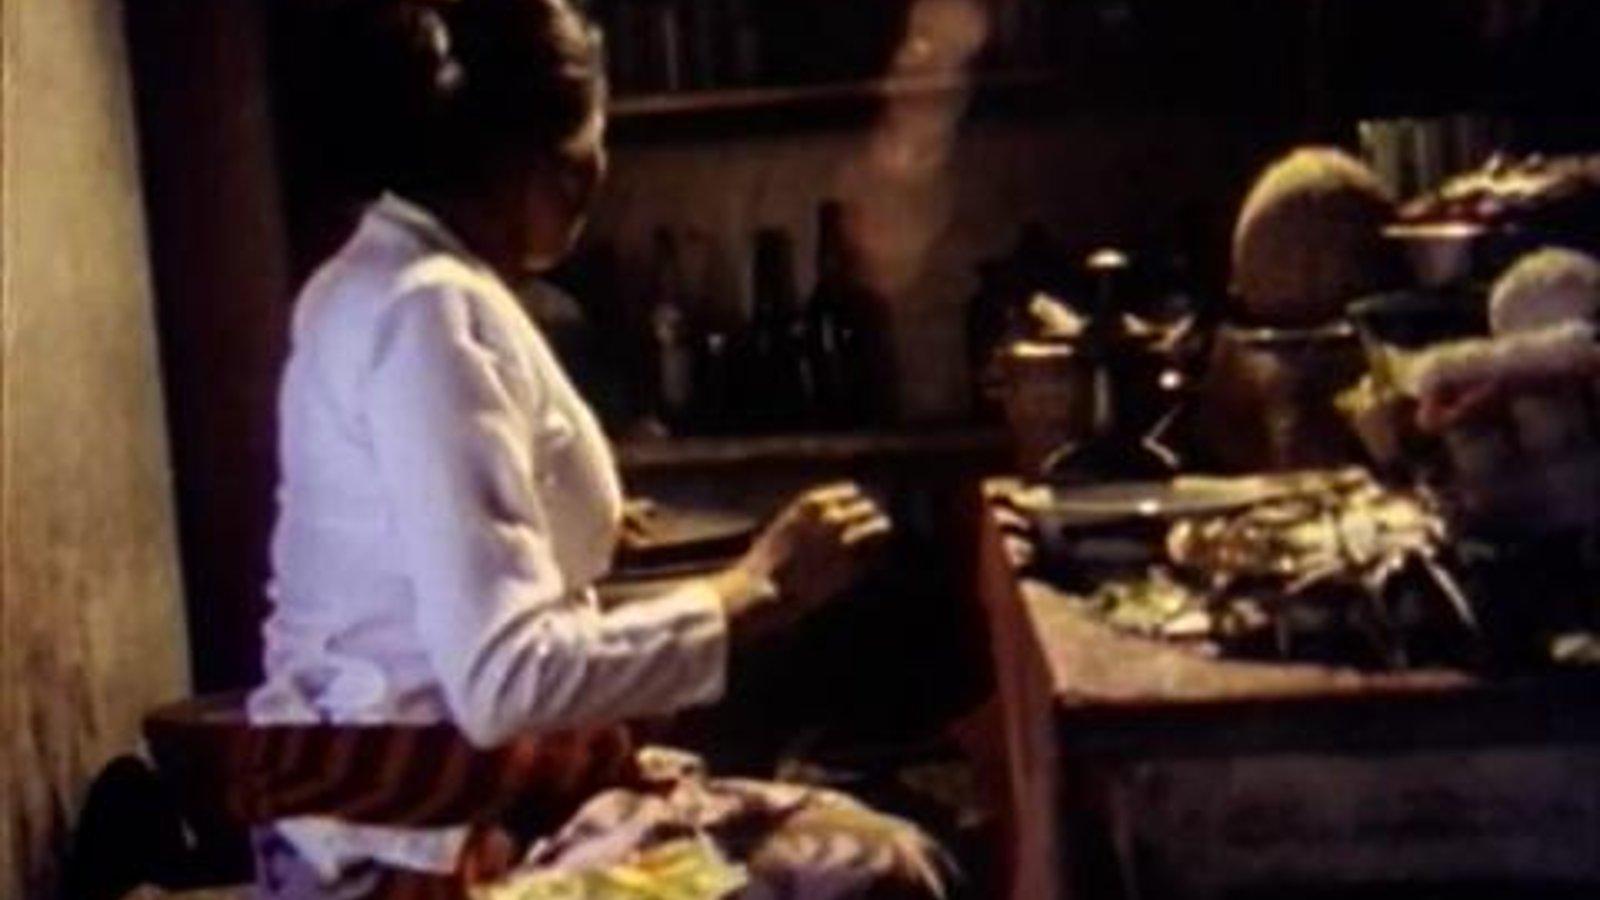 A Balinese Trance Seance and Jero on Jero